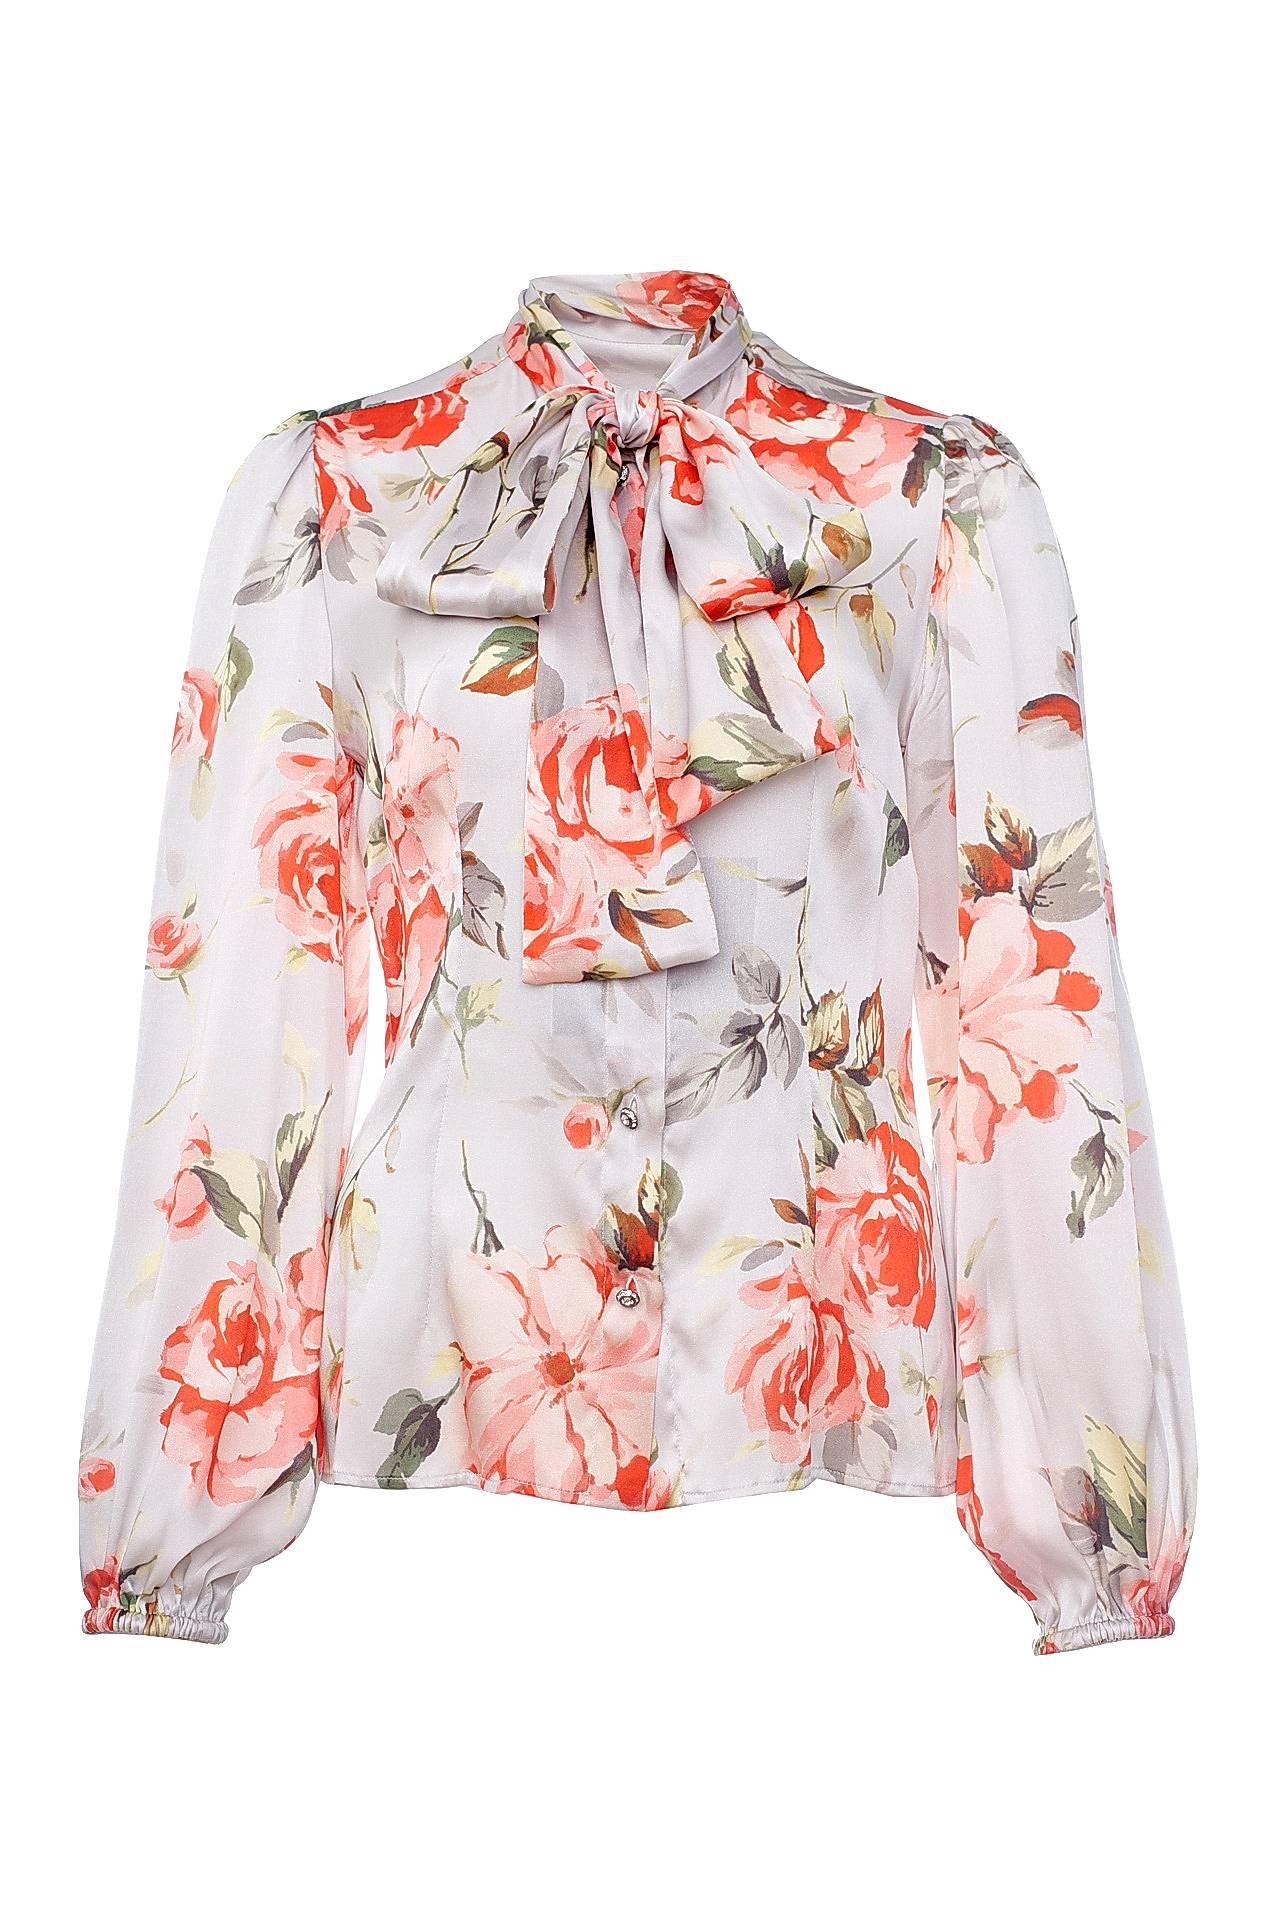 Купить блузку производство италия